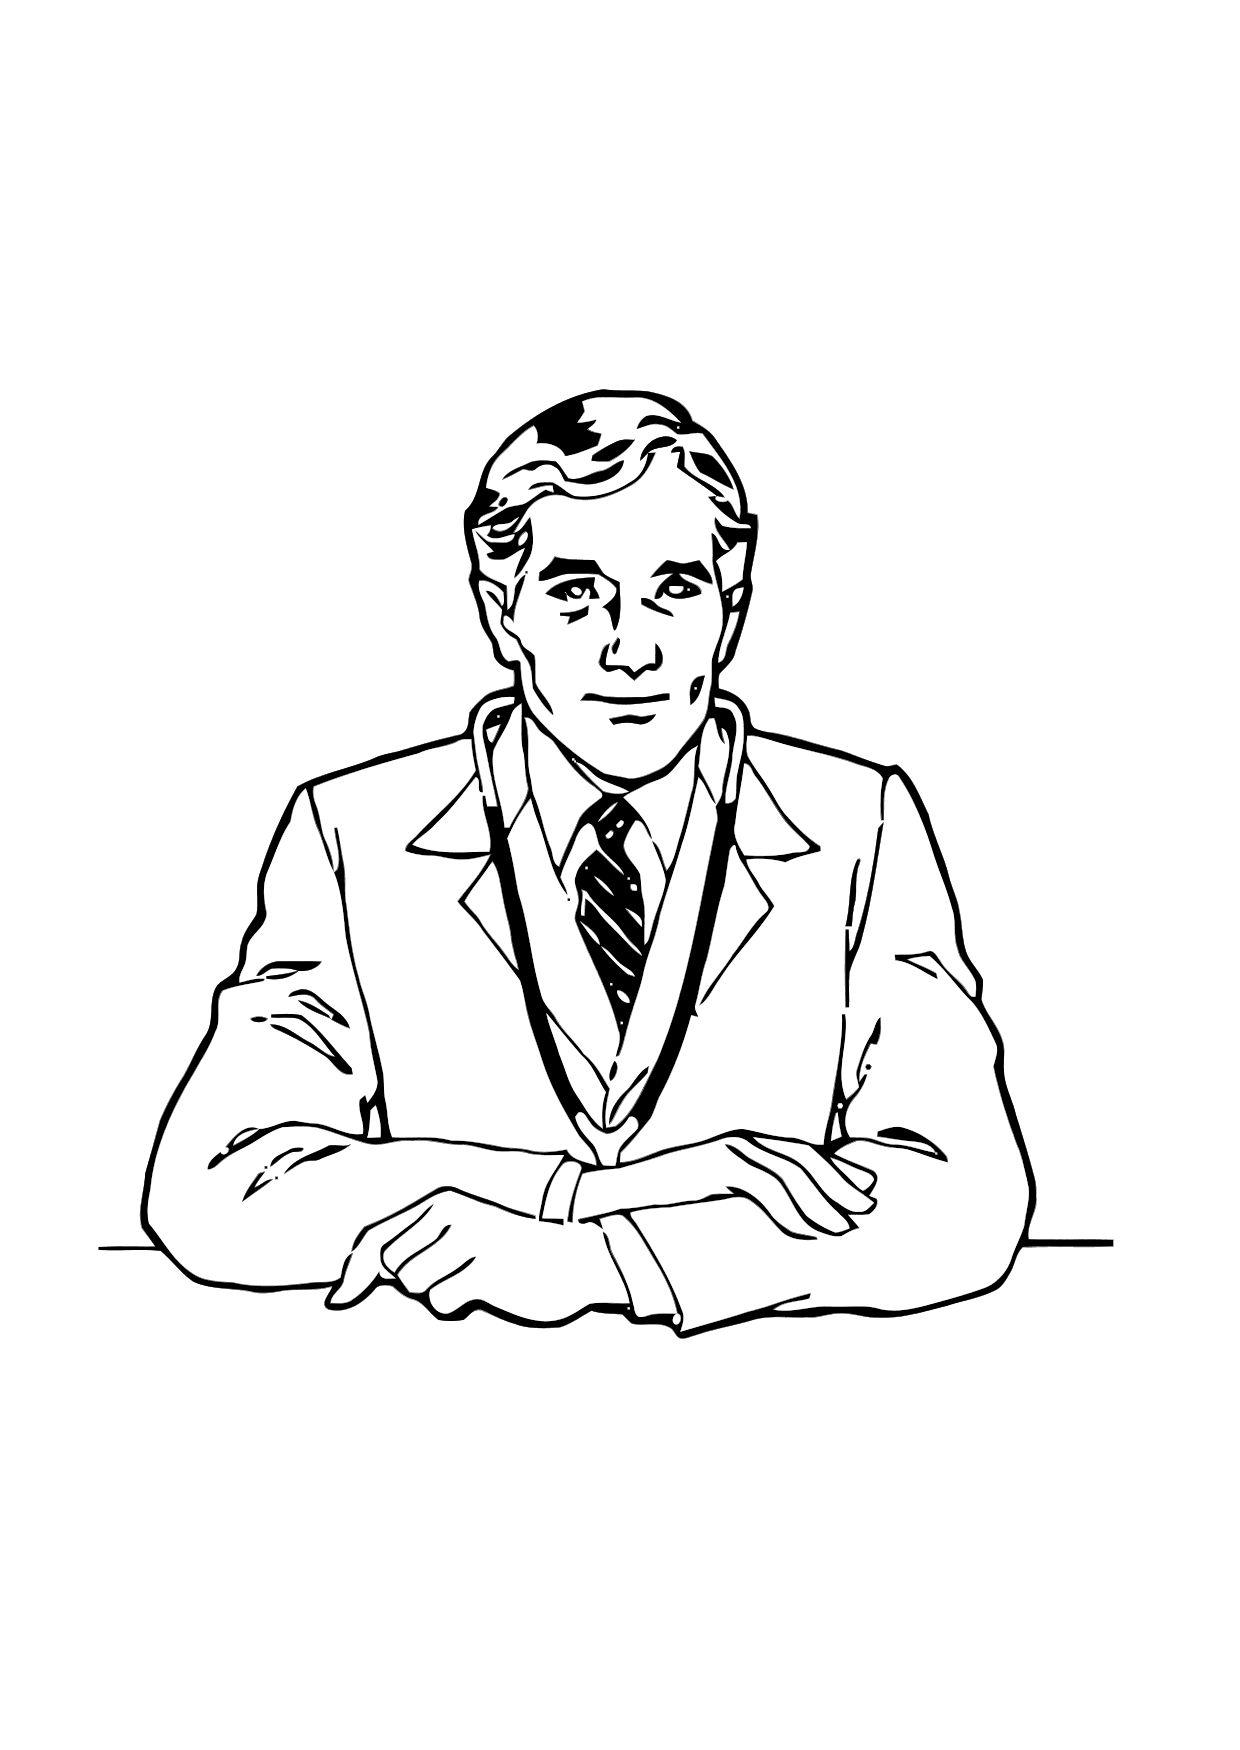 Dibujo Para Colorear Médico Dibujos Para Imprimir Gratis